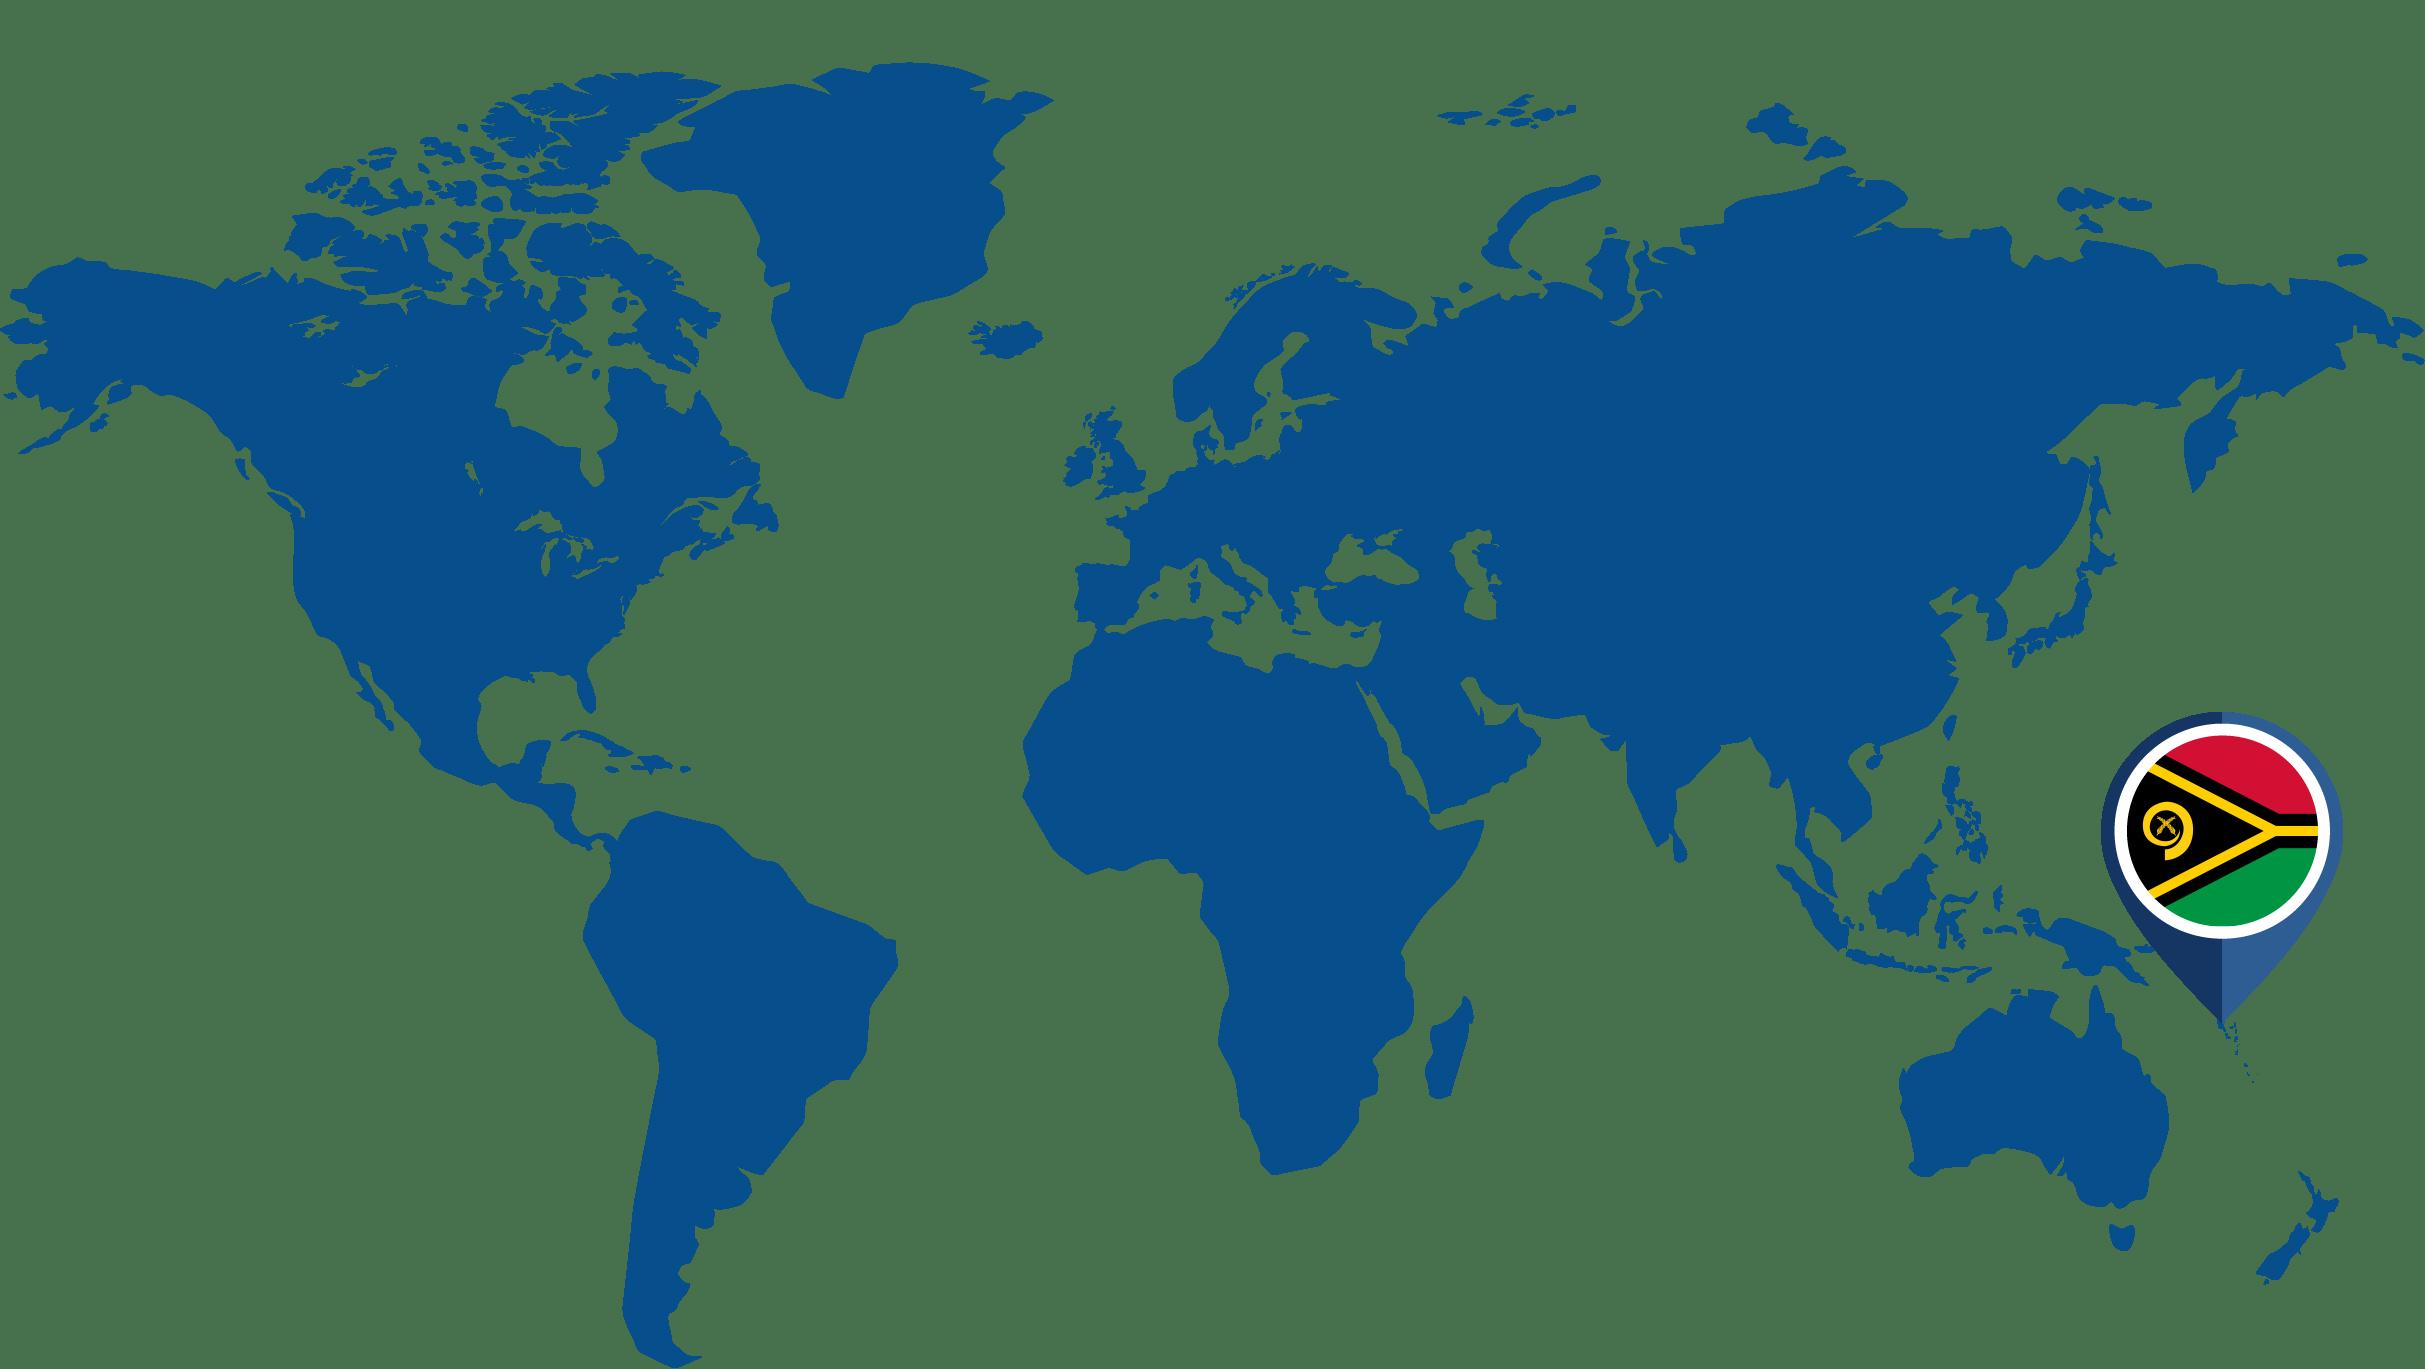 https://www.bluemina.com/wp-content/uploads/2020/02/vanuatu-map-01-1.png